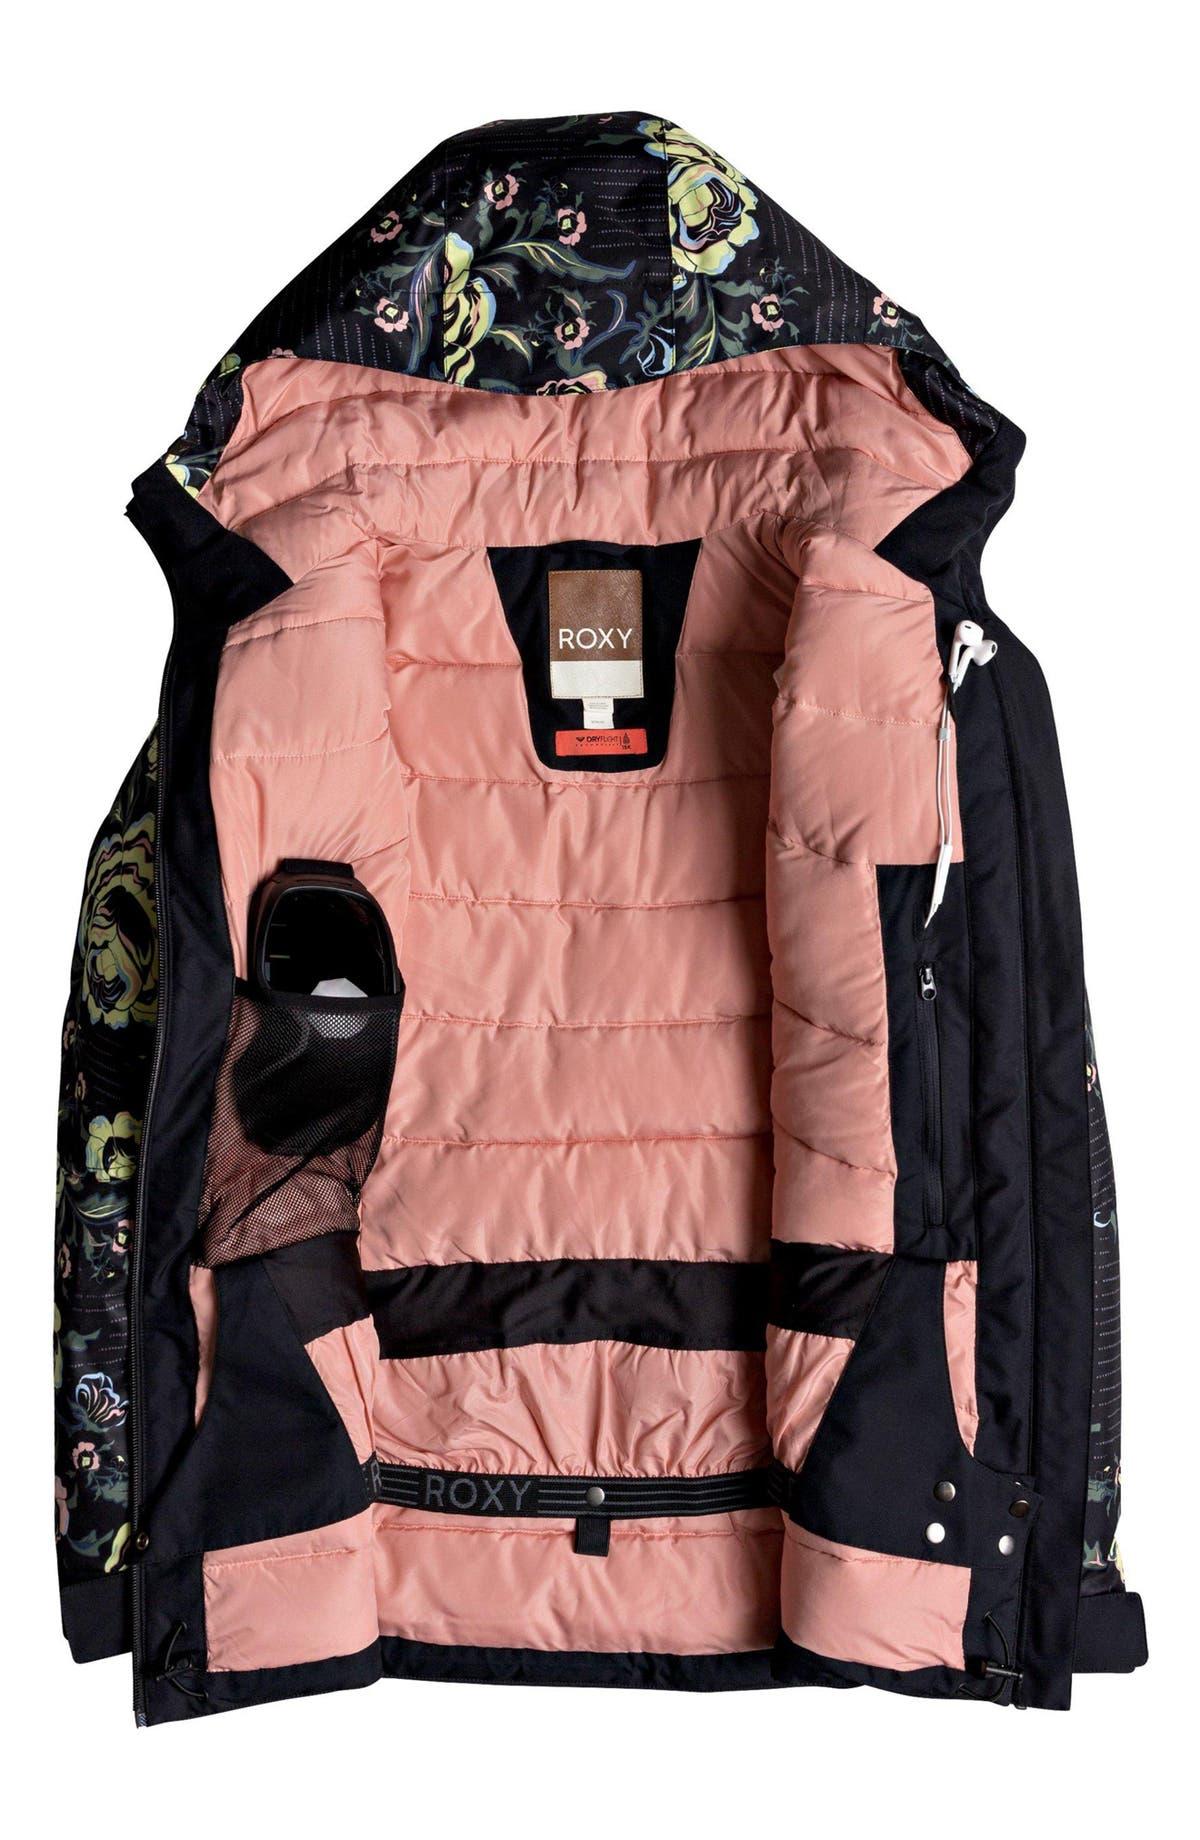 Roxy Snowflake Torah Jacket Snow Nordstrom Bright 4qn6OxwT4